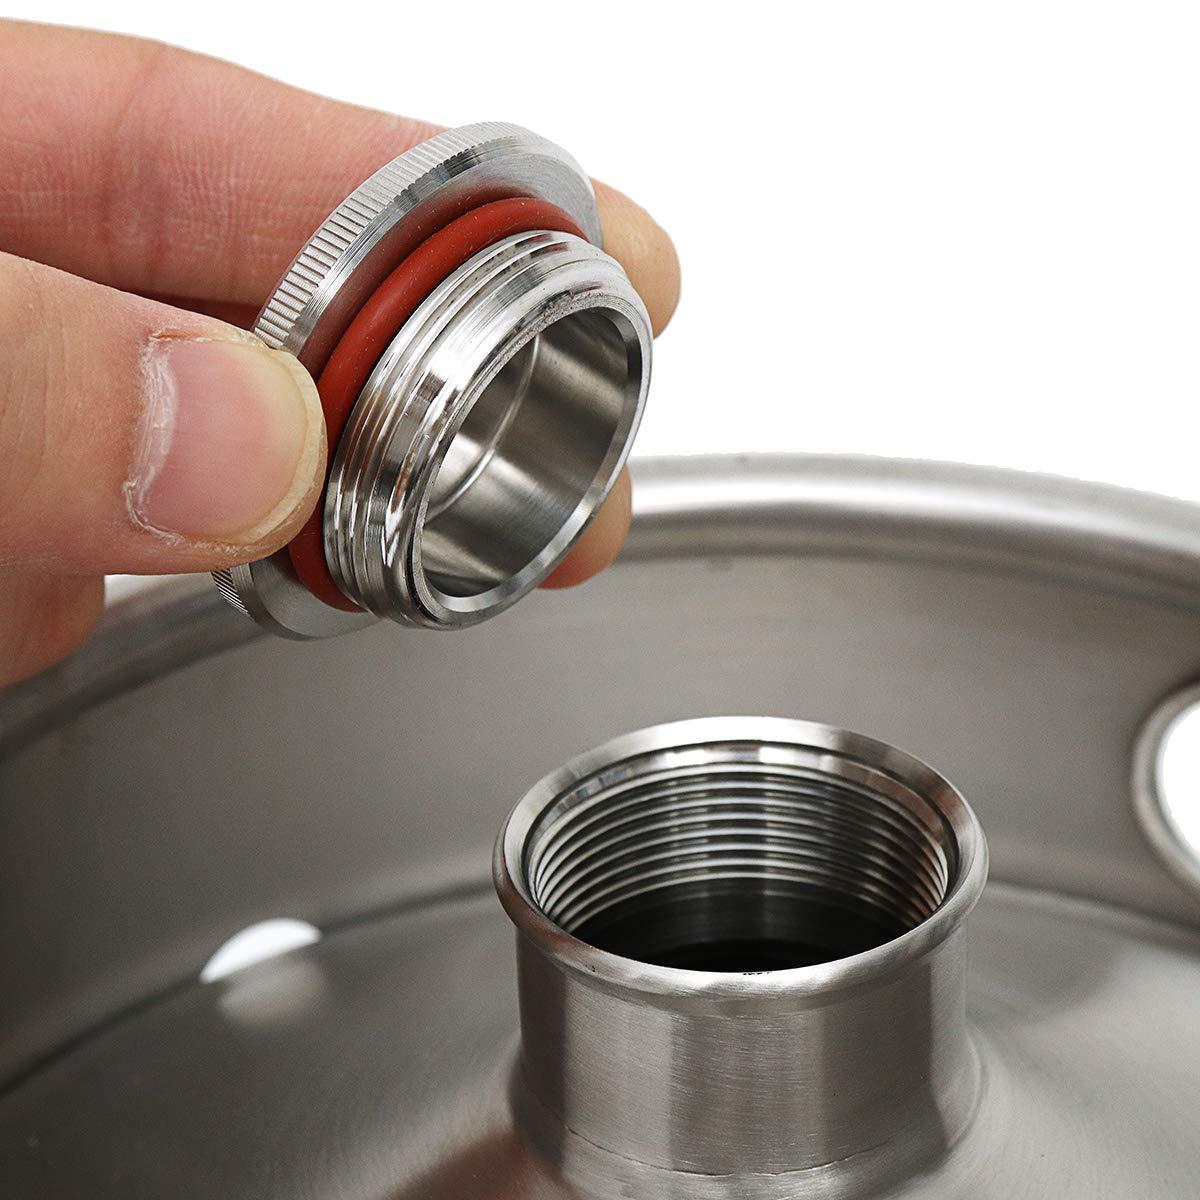 Stainless Steel Brew Barrel, SENREAL 10L Stainless Steel Cast Growler Barrel Beer Wine Making Tools Accessories by SENREAL (Image #5)